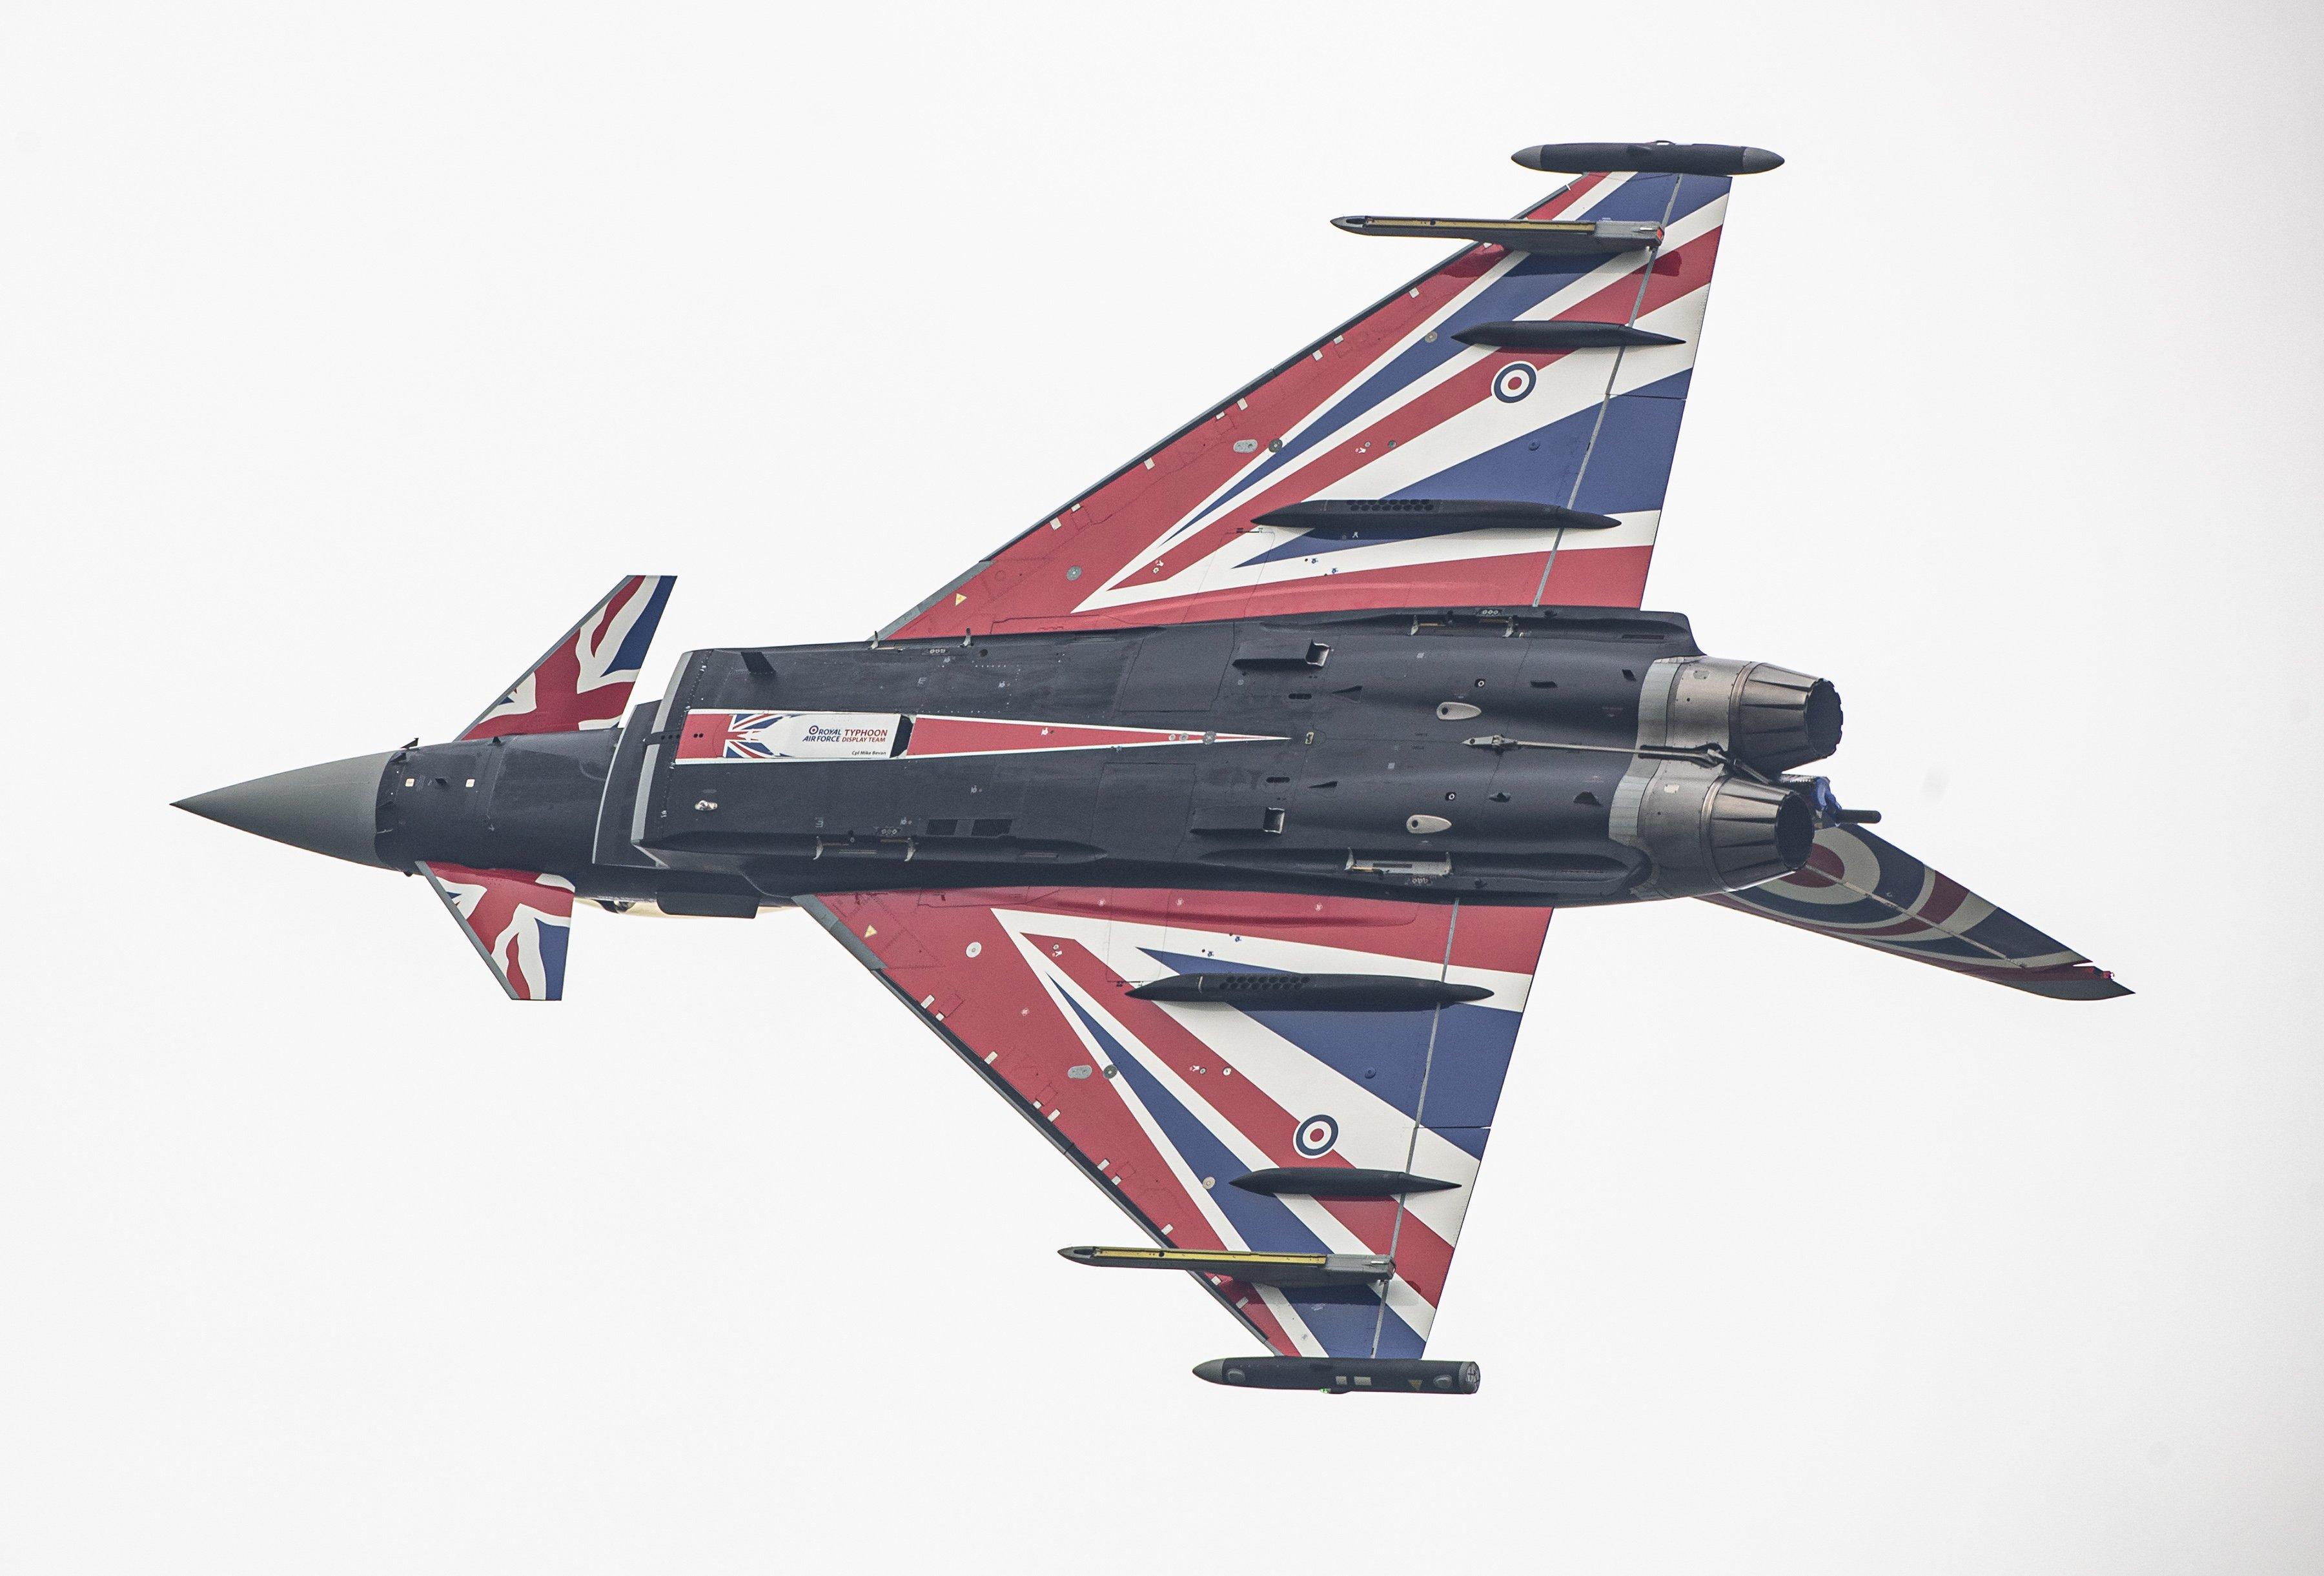 Eurofighter Typhoon FGR4 Union Jack Paint Scheme [MOD Crown Copyright/Sgt Paul Oldfield]